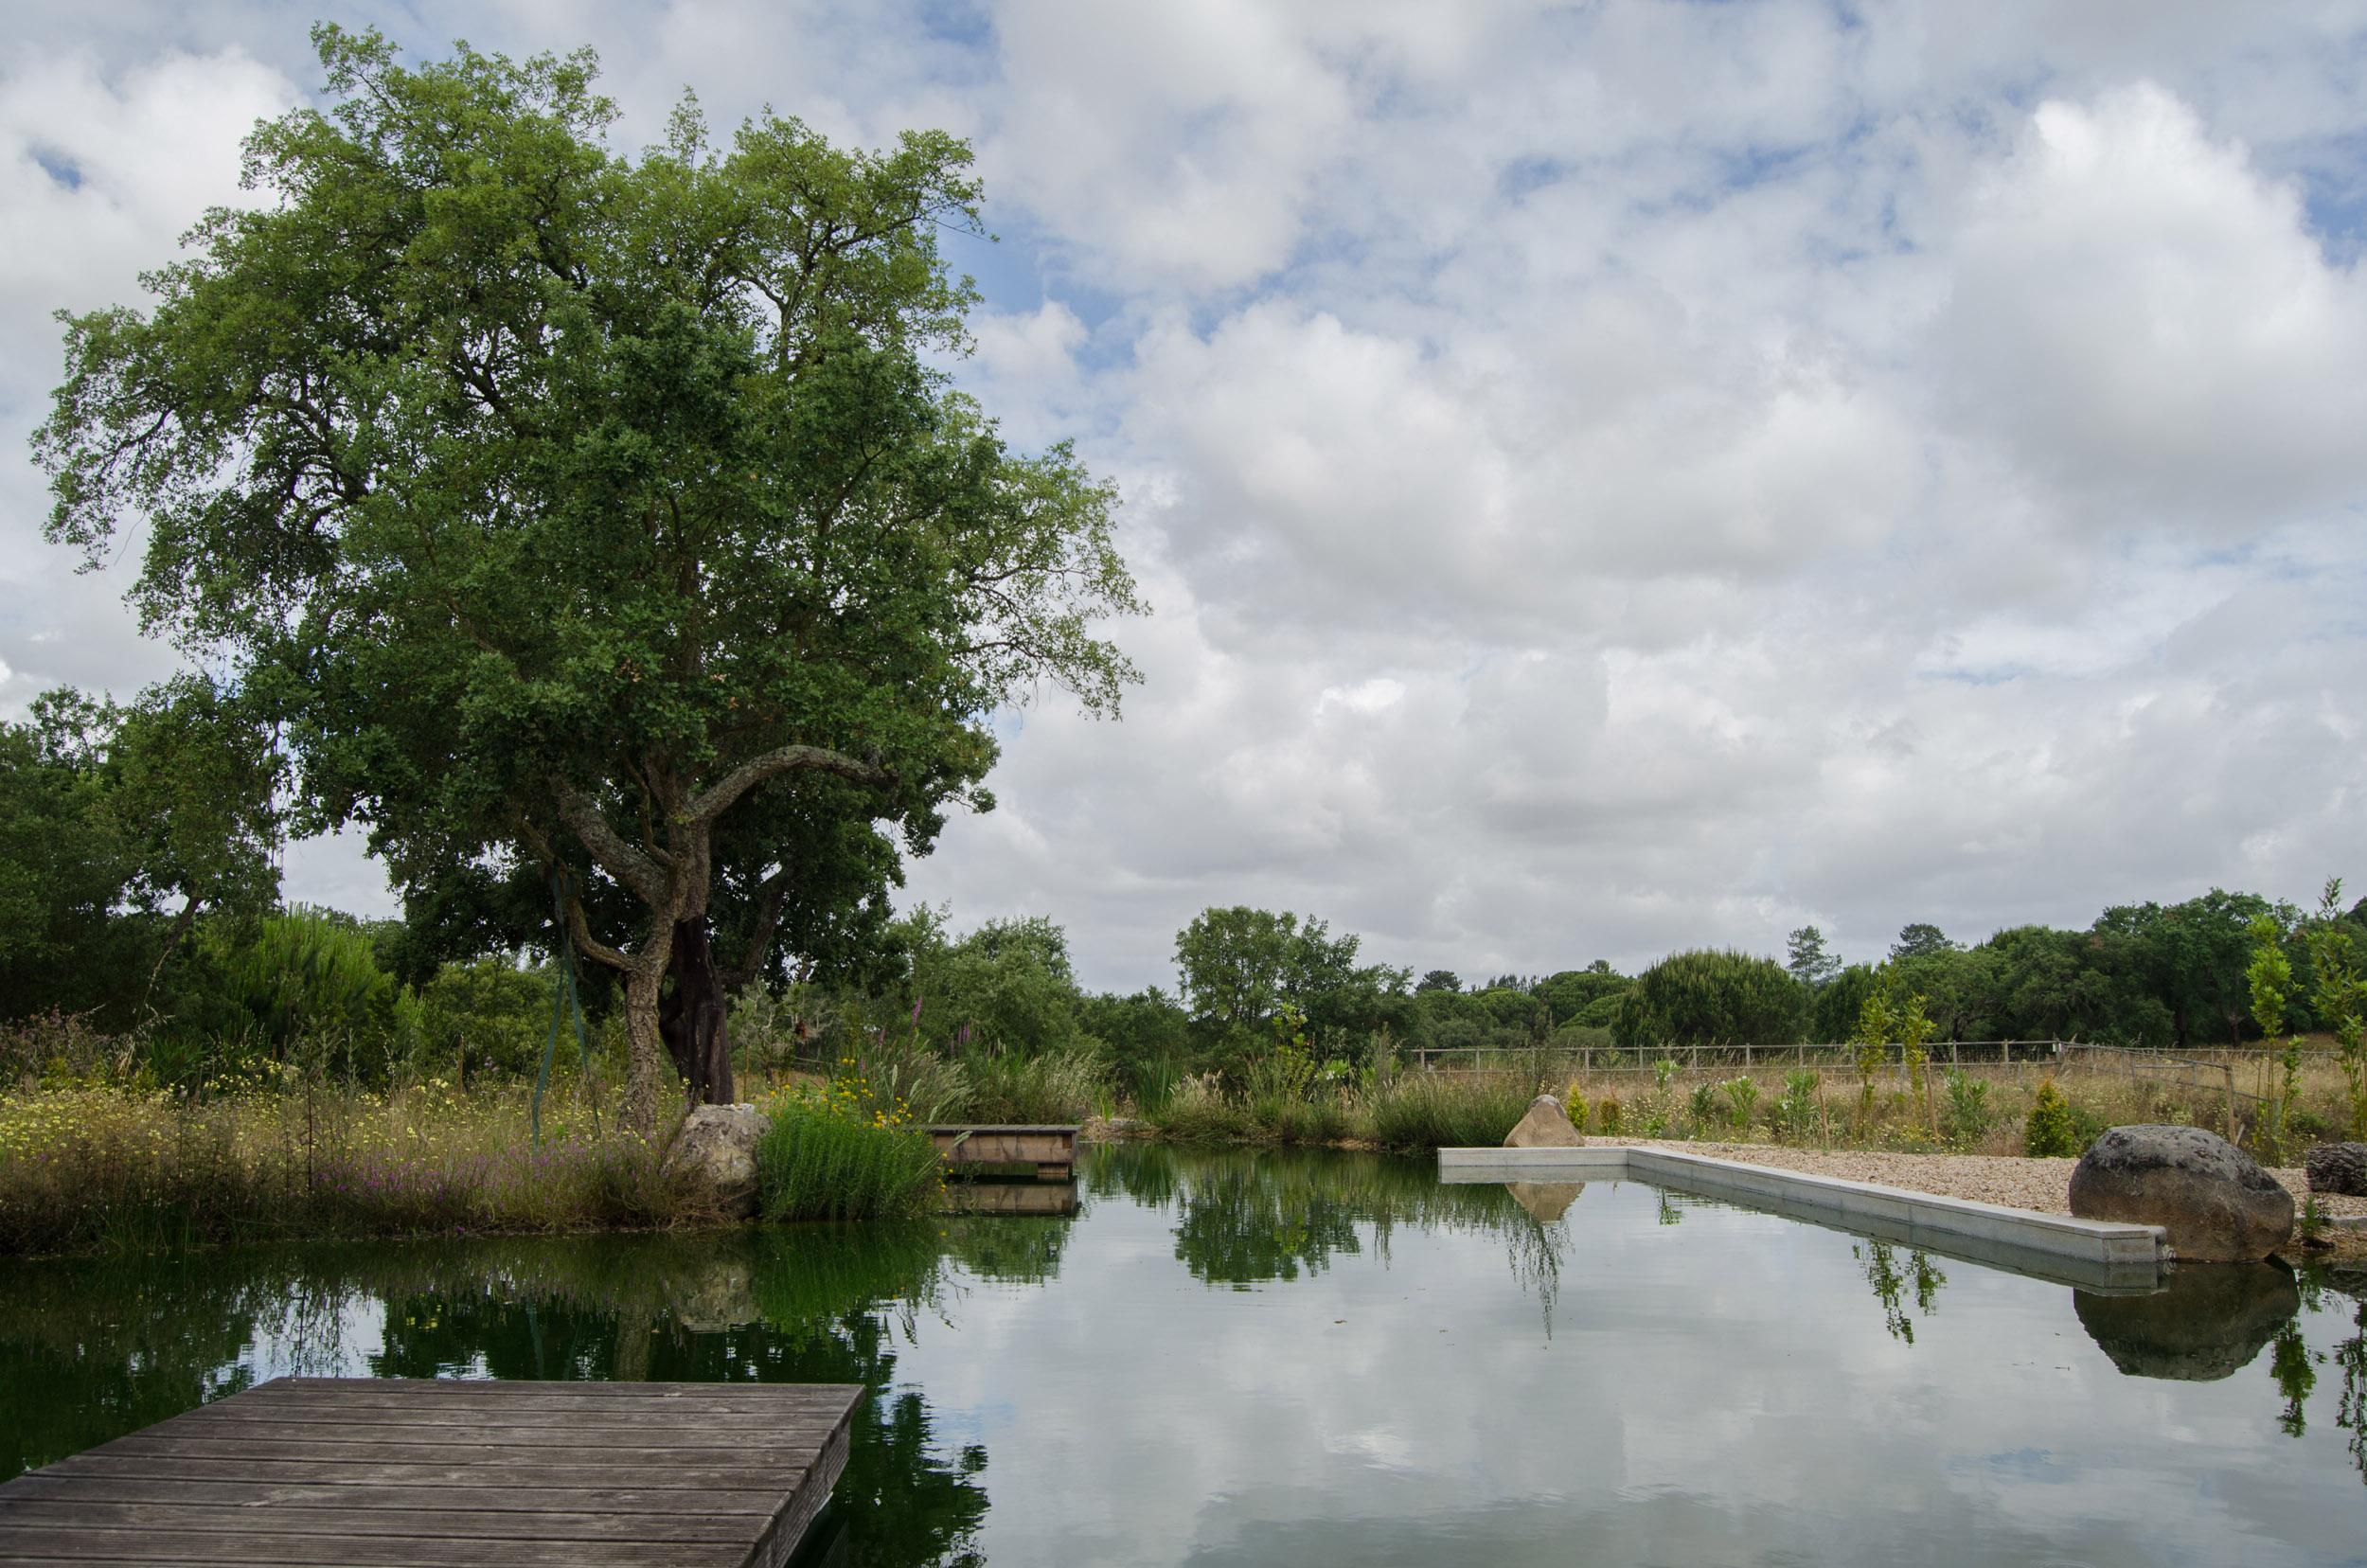 Benavente piscinas biol gicas for Piscinas benavente